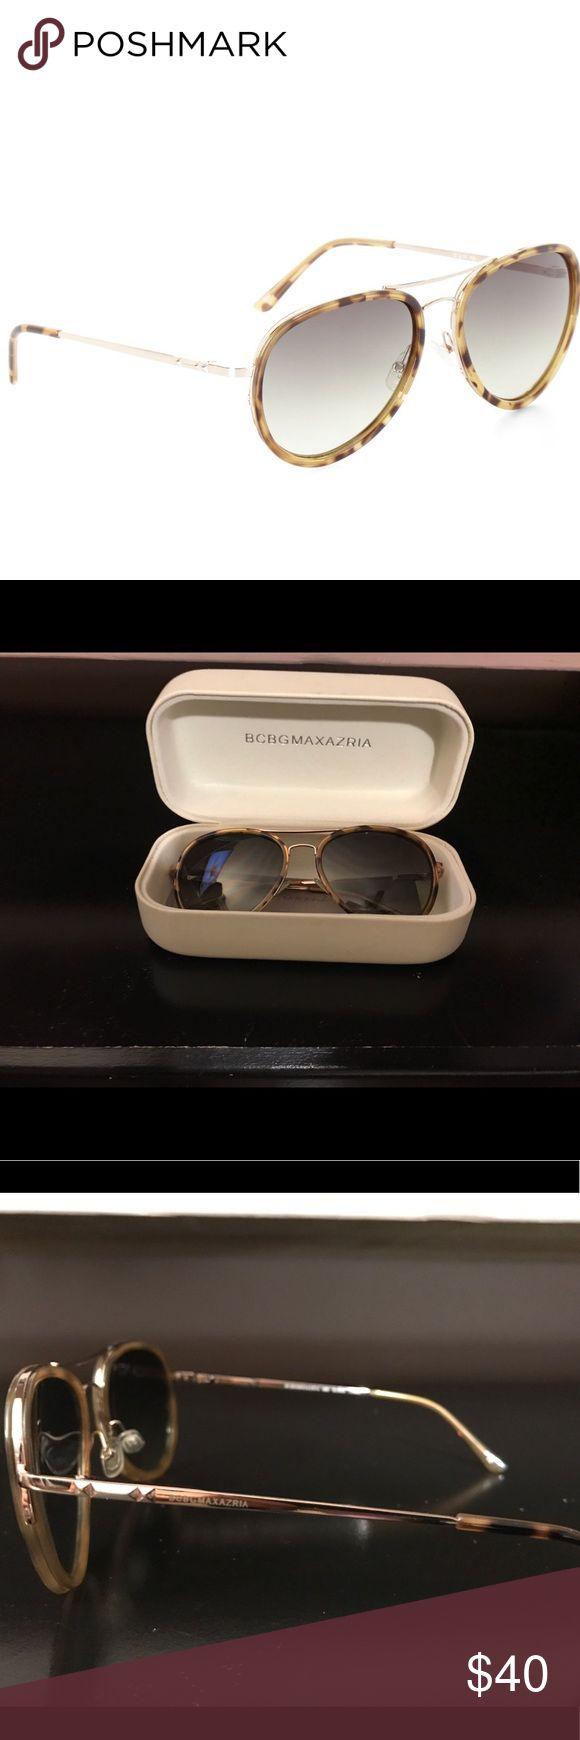 BCBG MAXAZARIA sunglasses Leopard blonde combo BCBG sunglasses in amazing condition! Worn once. Case is worn due to storage. Comes with original dust cloth and case. BCBGMaxAzria Accessories Sunglasses